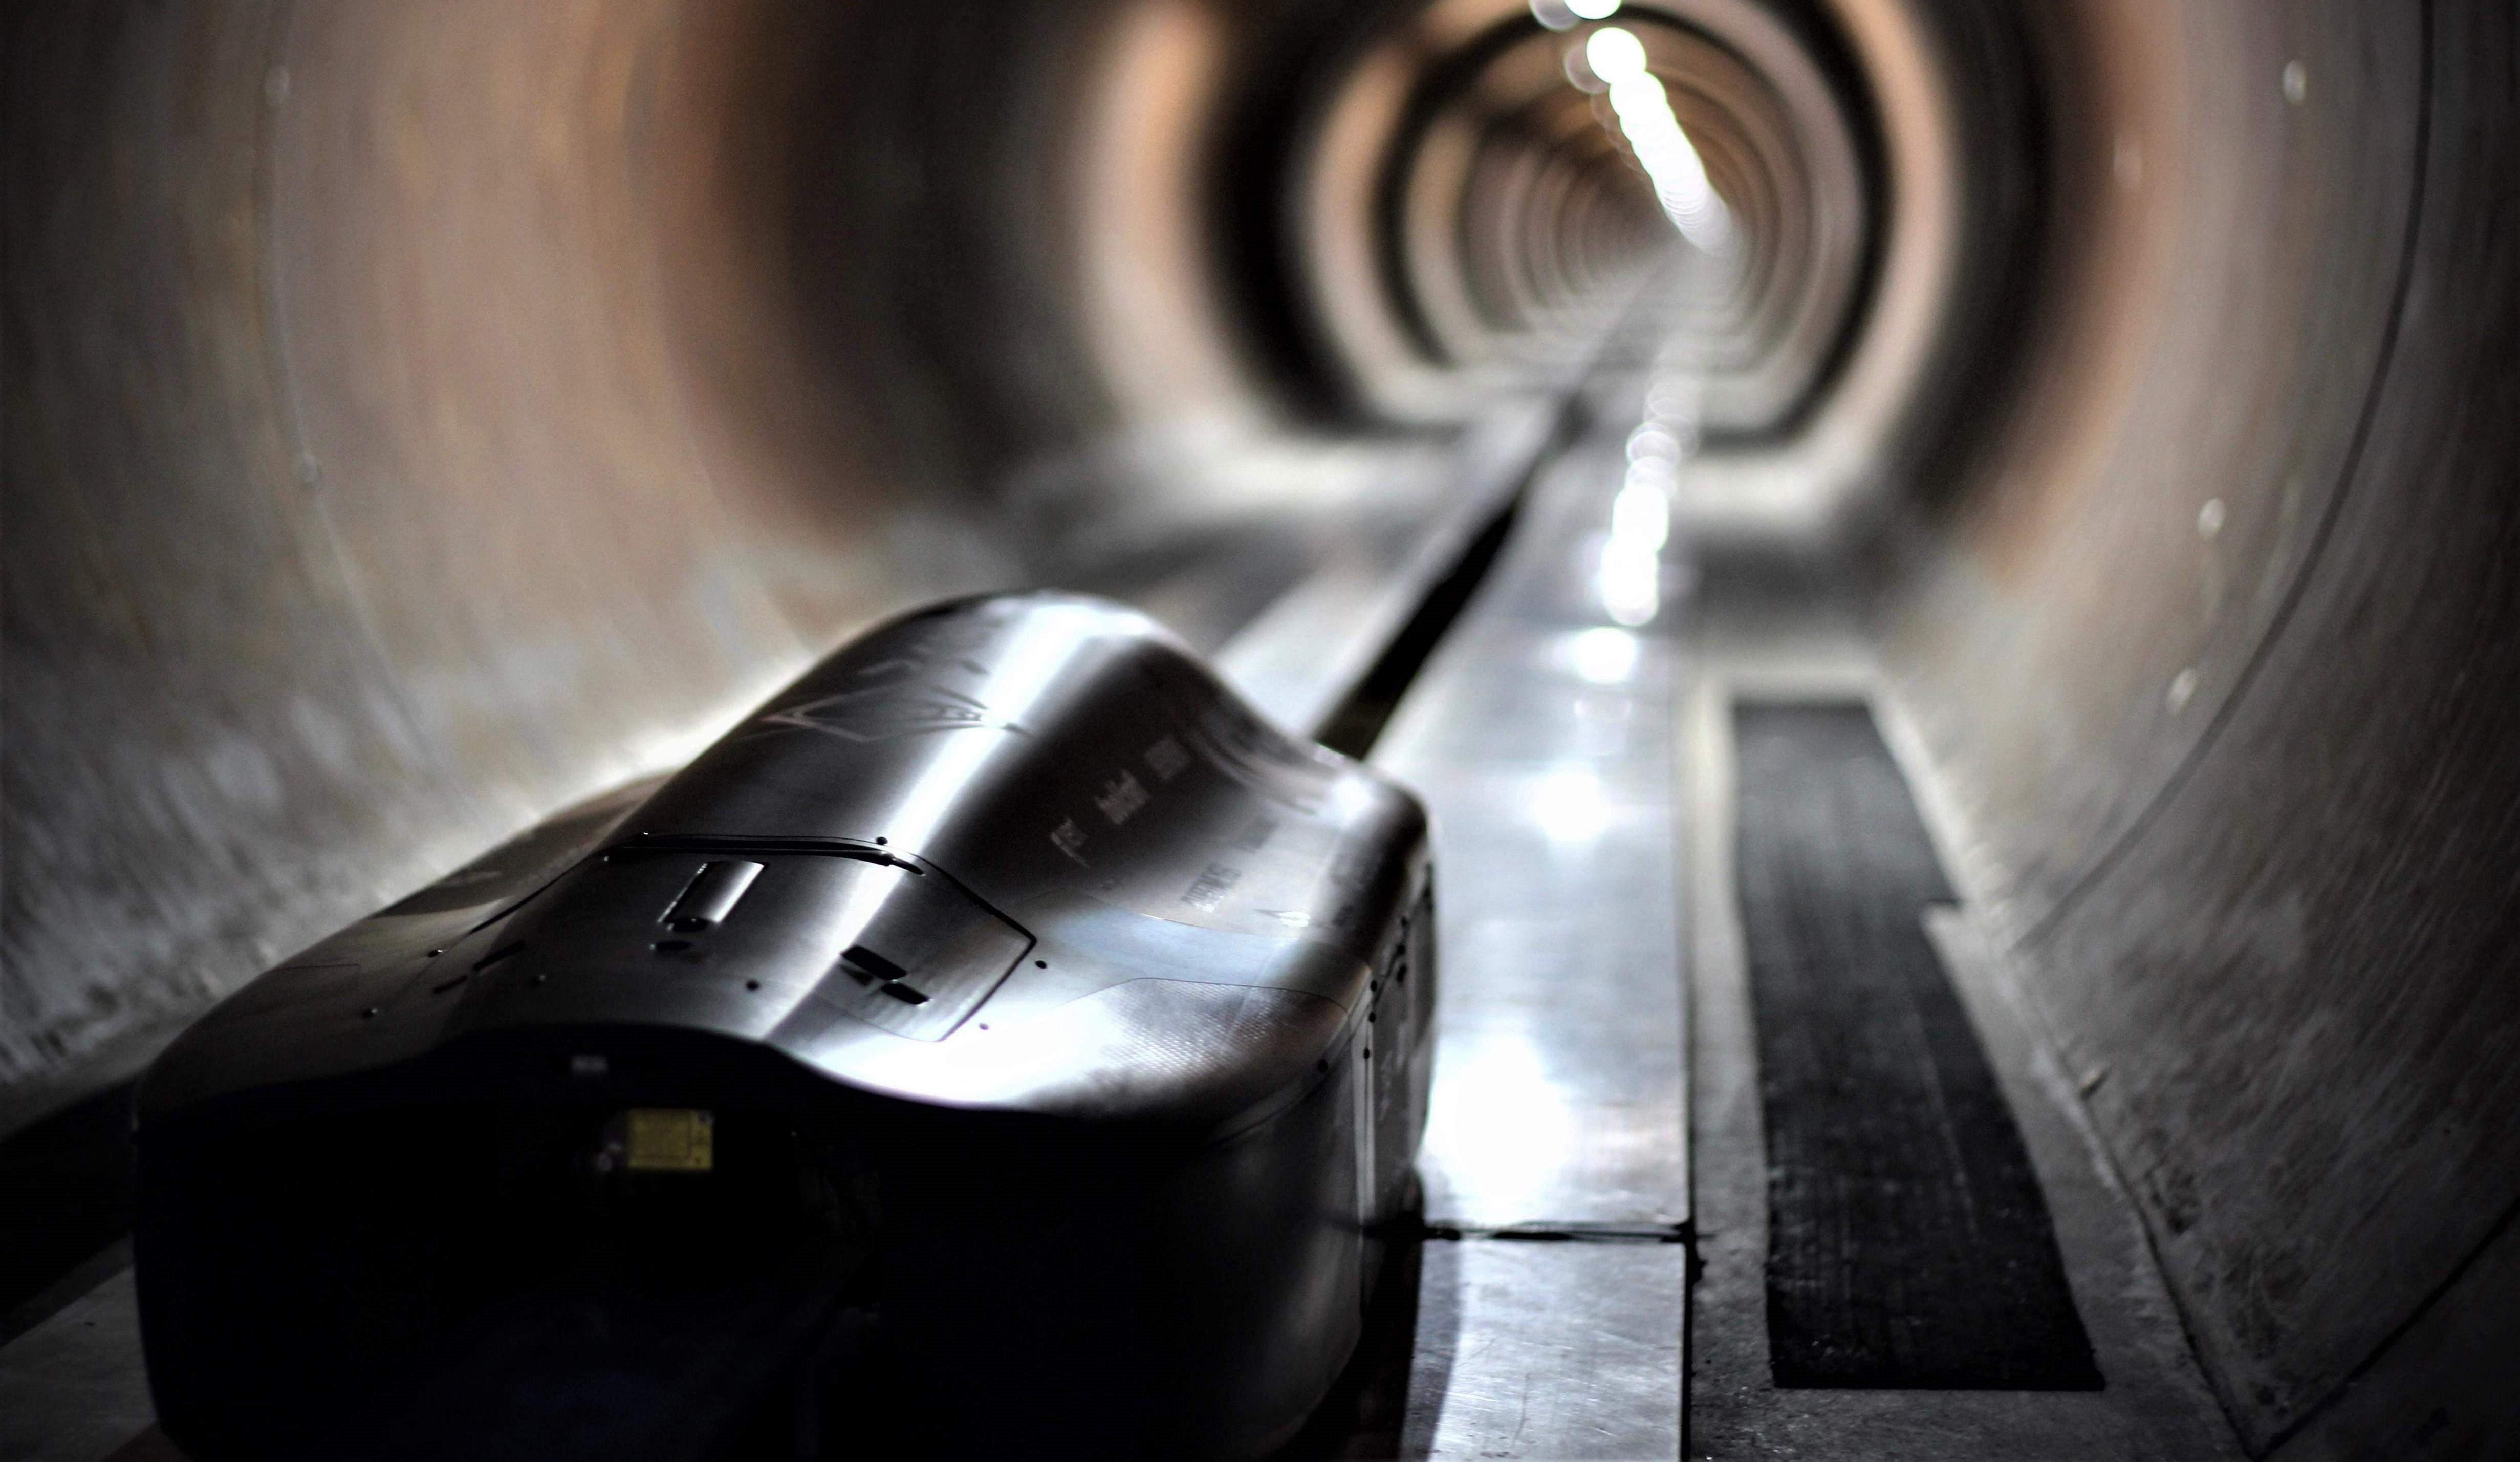 WARR Hyperloop pod Competition 3 (WARR) 1